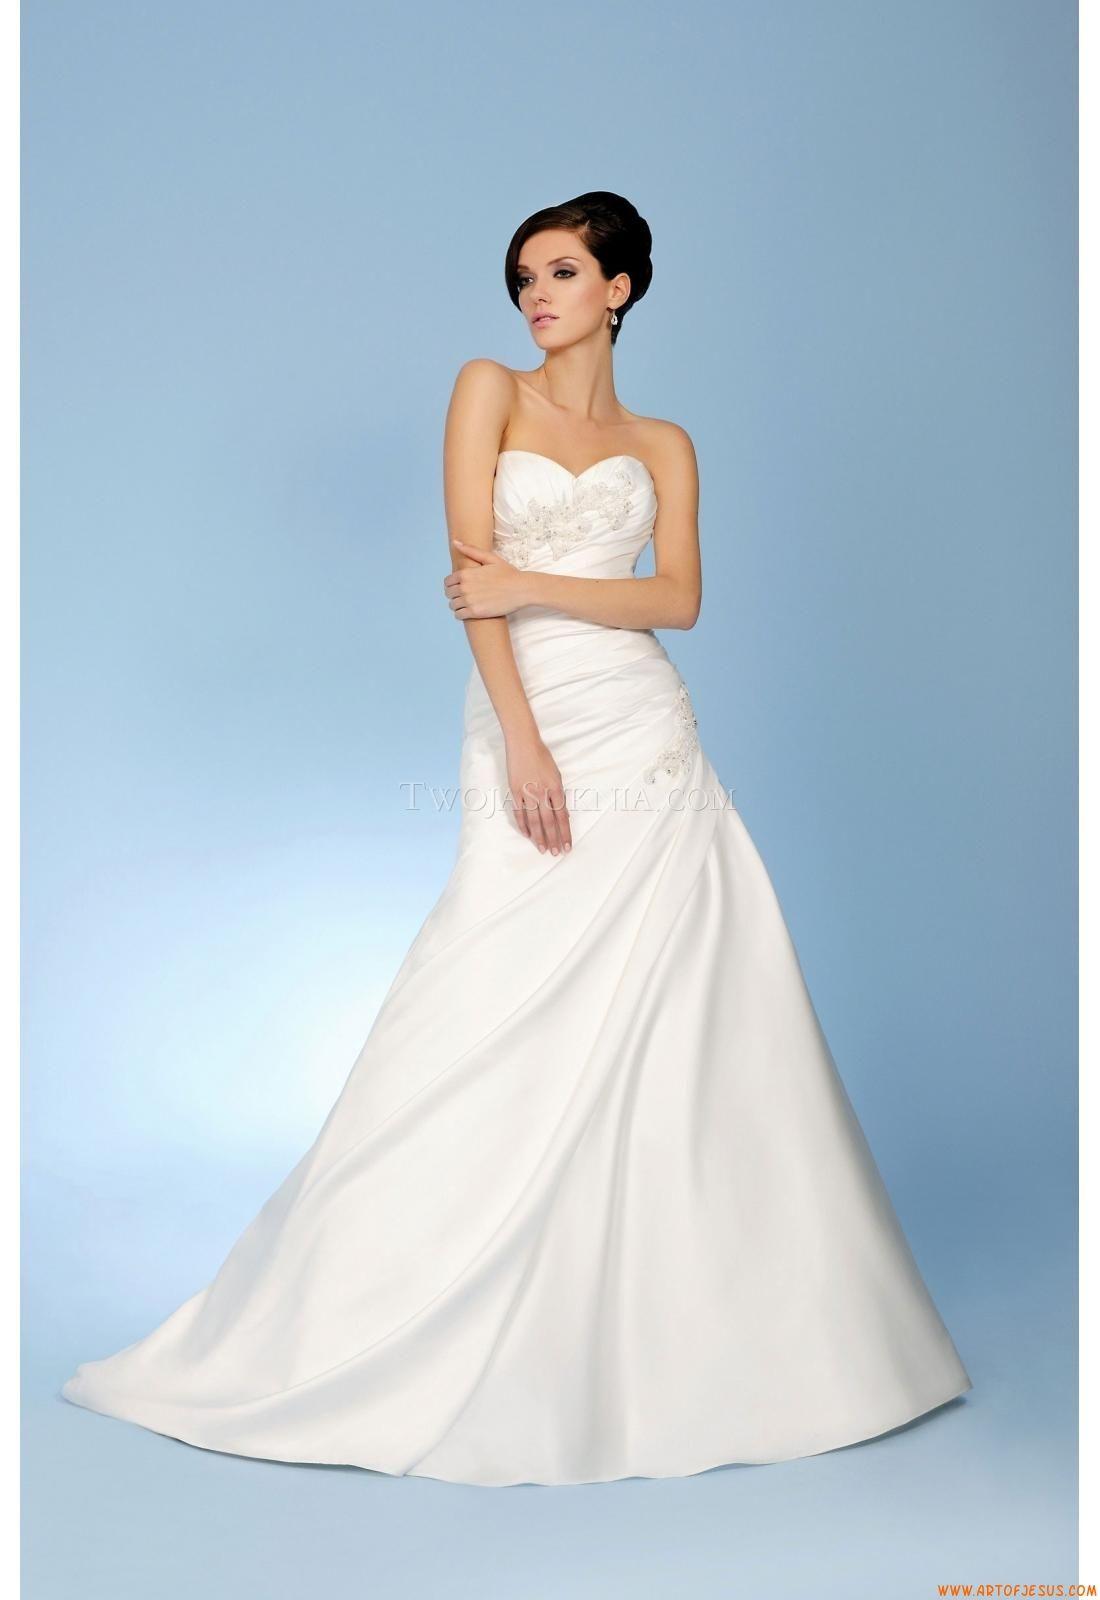 Elegant Sweetheart Ball Gown Court Train Unique Wedding Dress Trudy ...